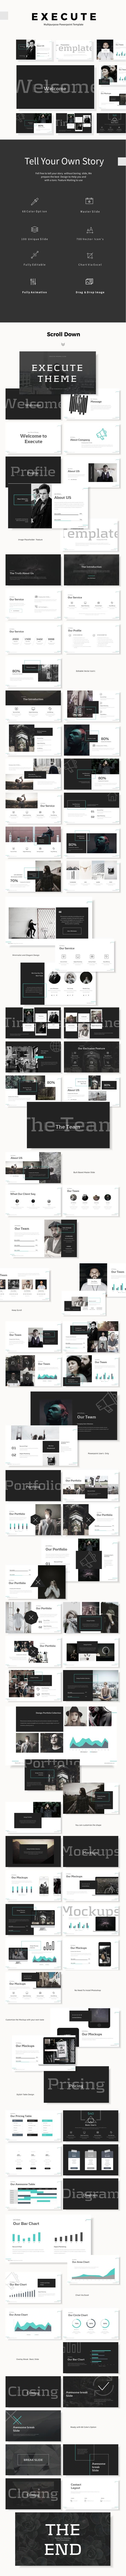 Execute Multipurpose Theme - PowerPoint Templates Presentation Templates